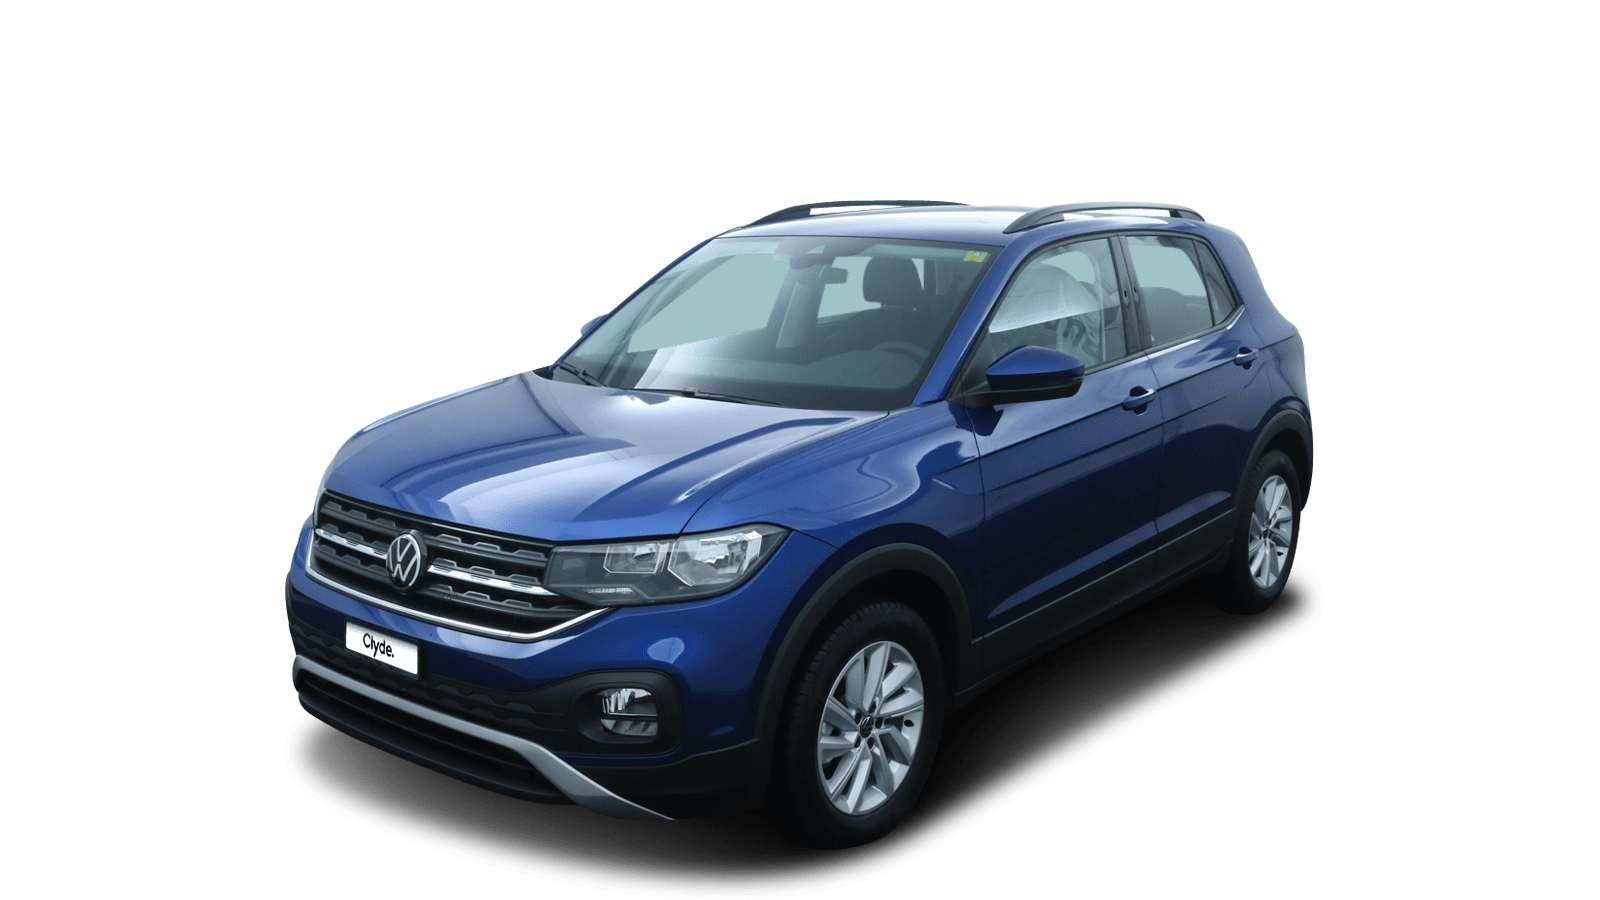 VW T-Cross Blue front - Clyde car subscription